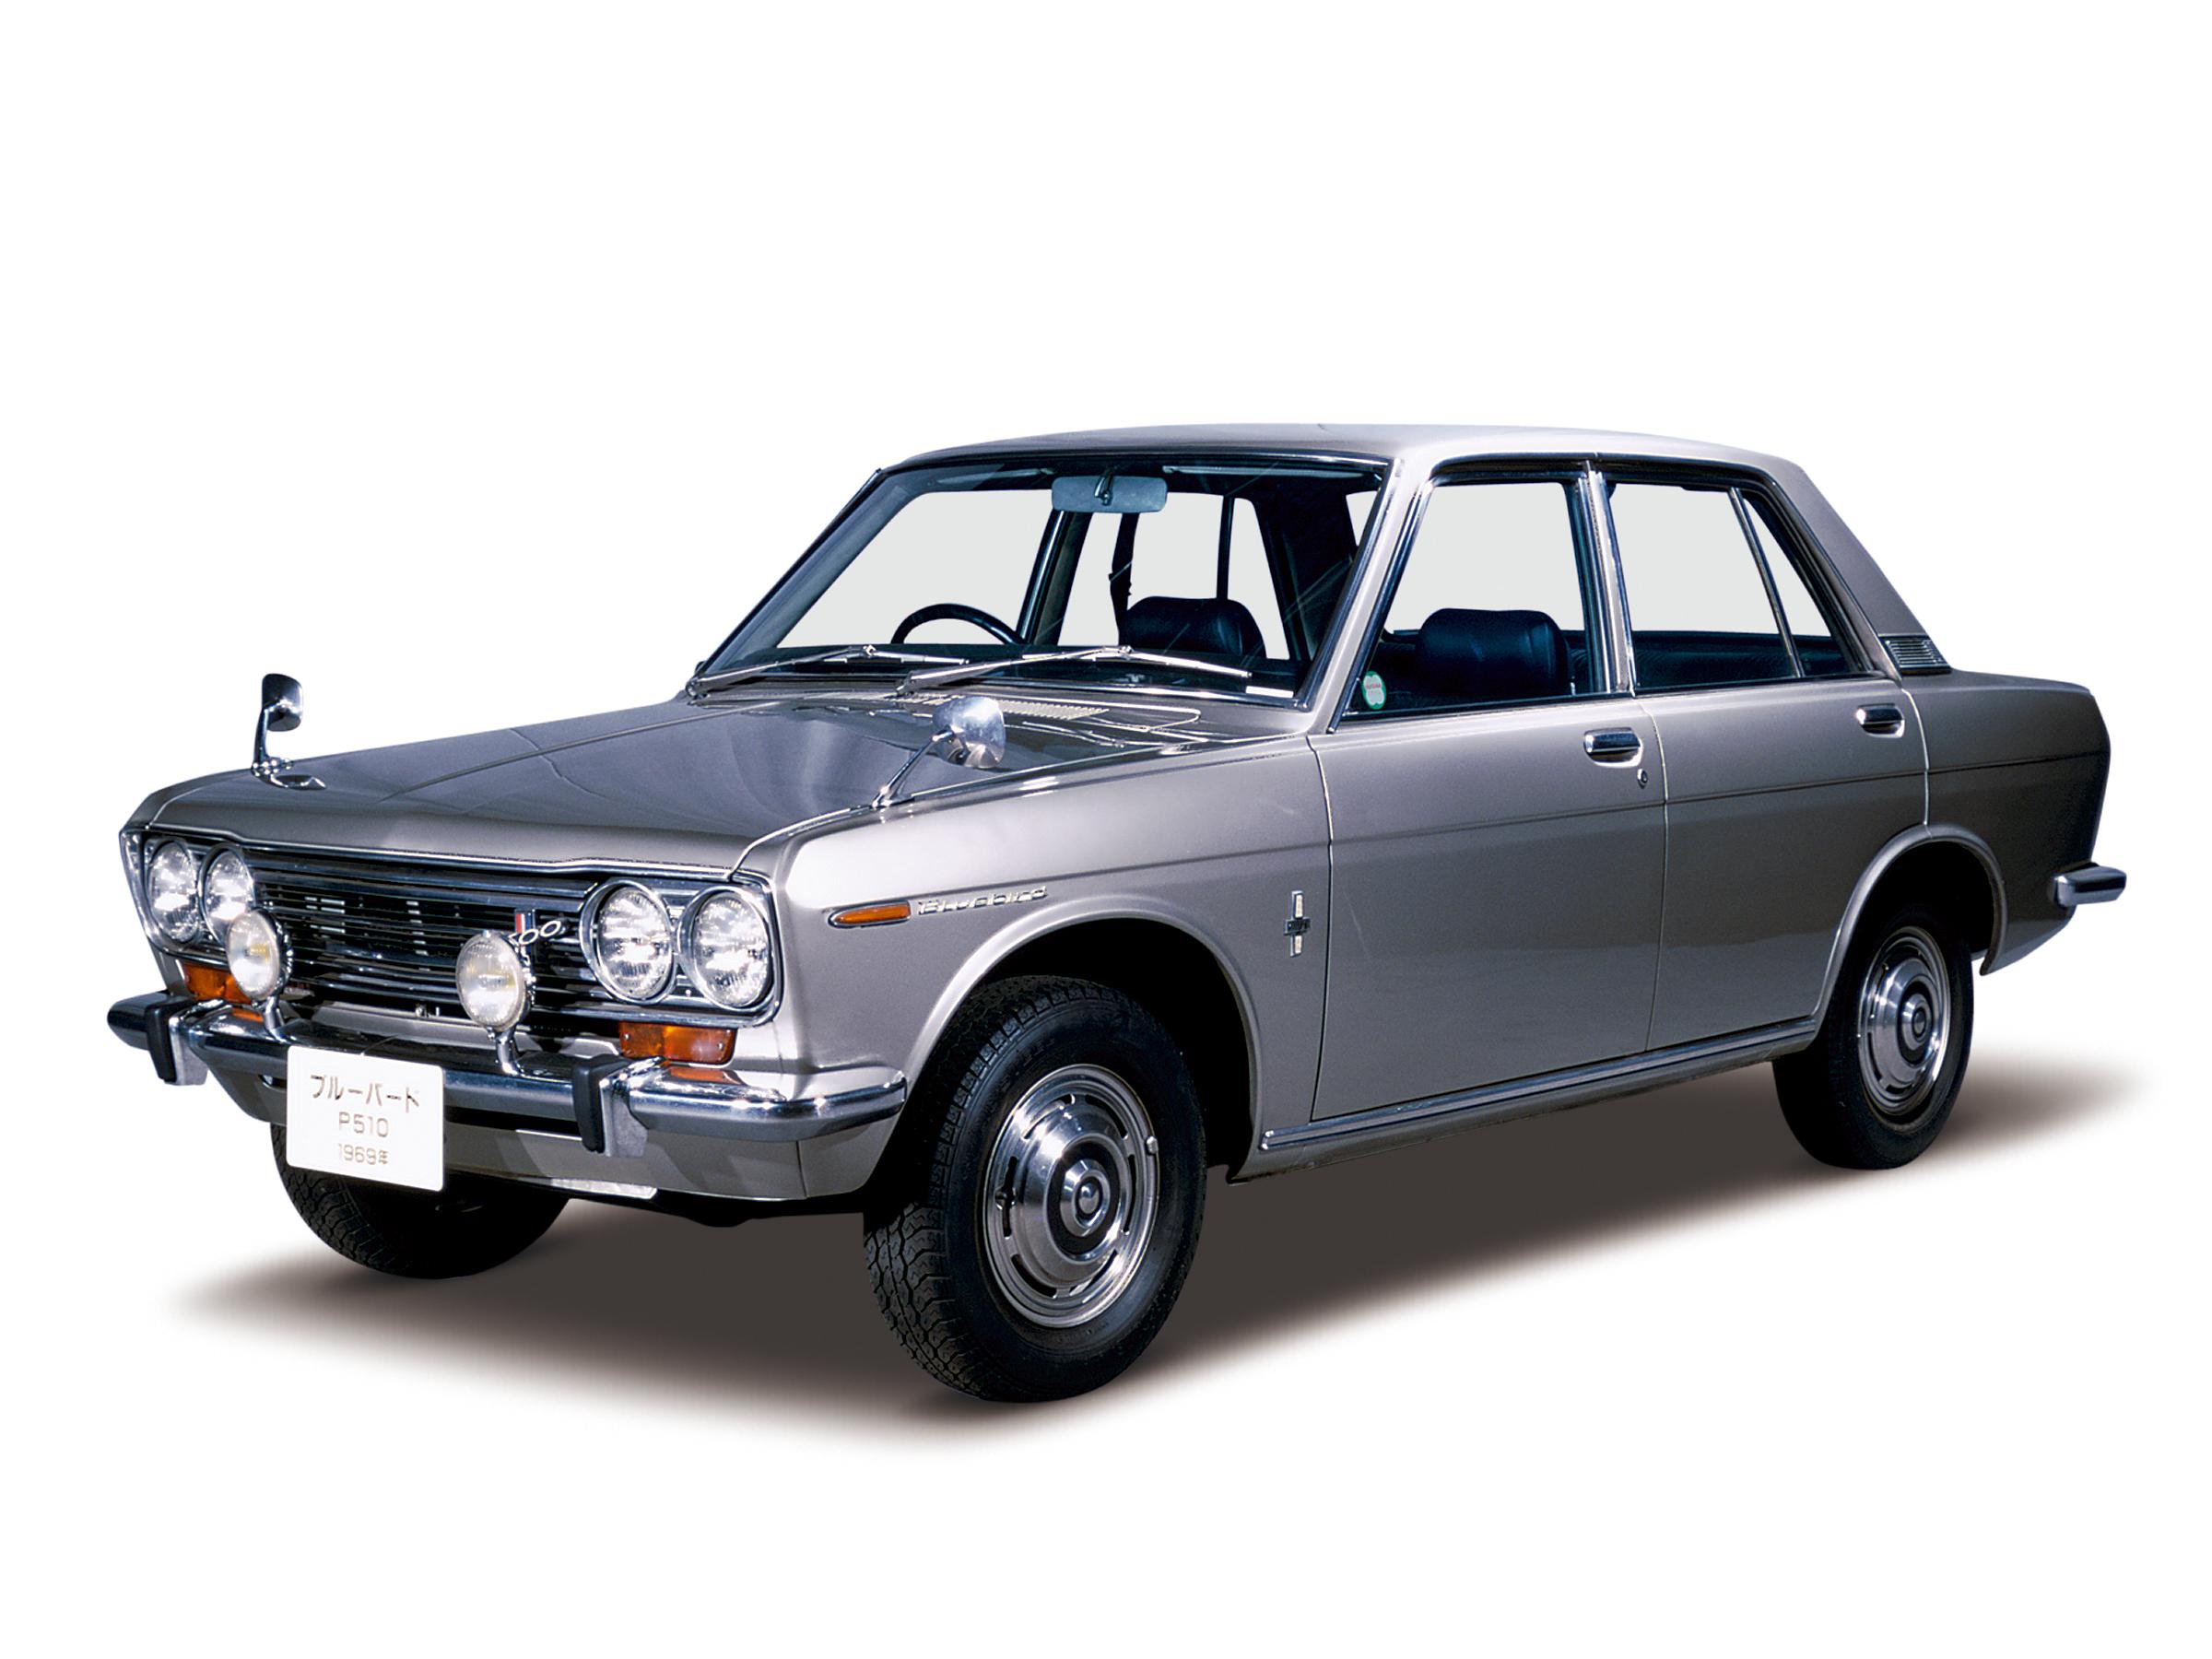 Nissan | Heritage Collection | Datsun Bluebird 1600 Deluxe